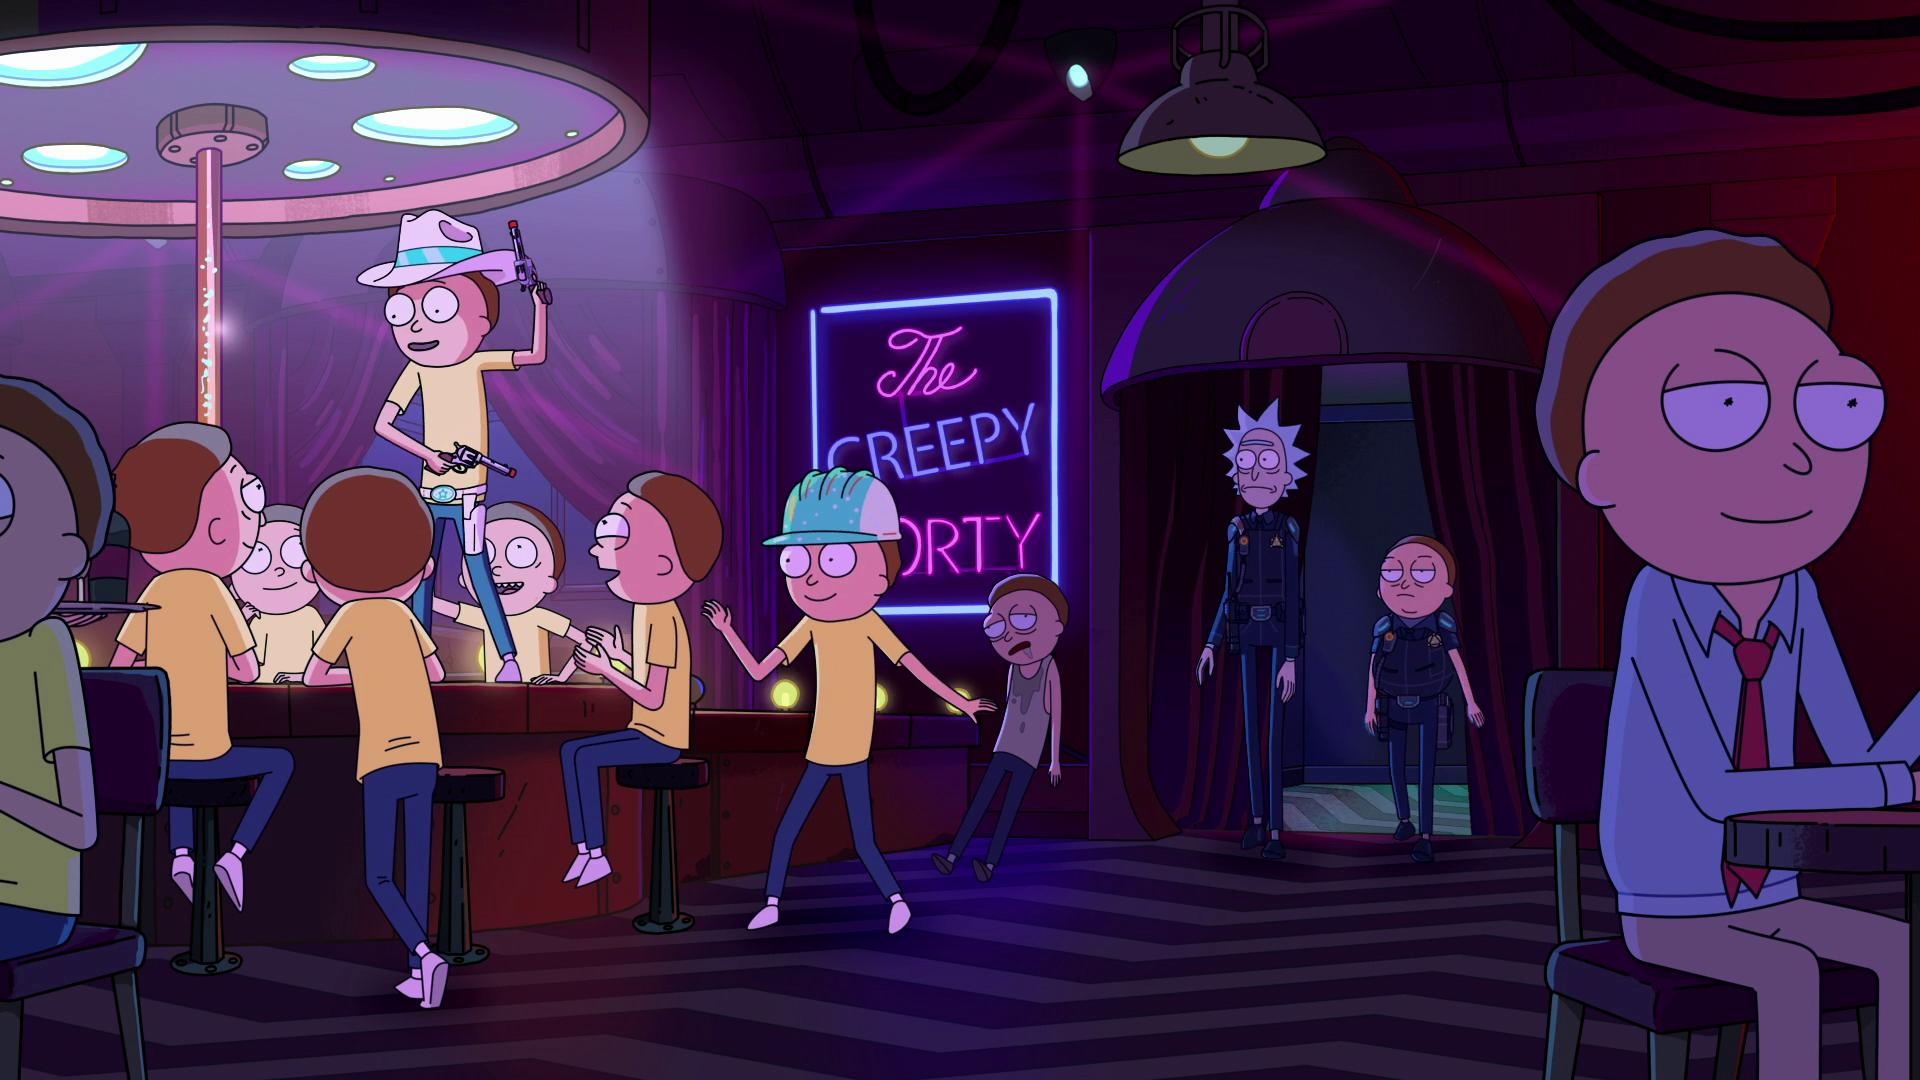 The Creepy Morty